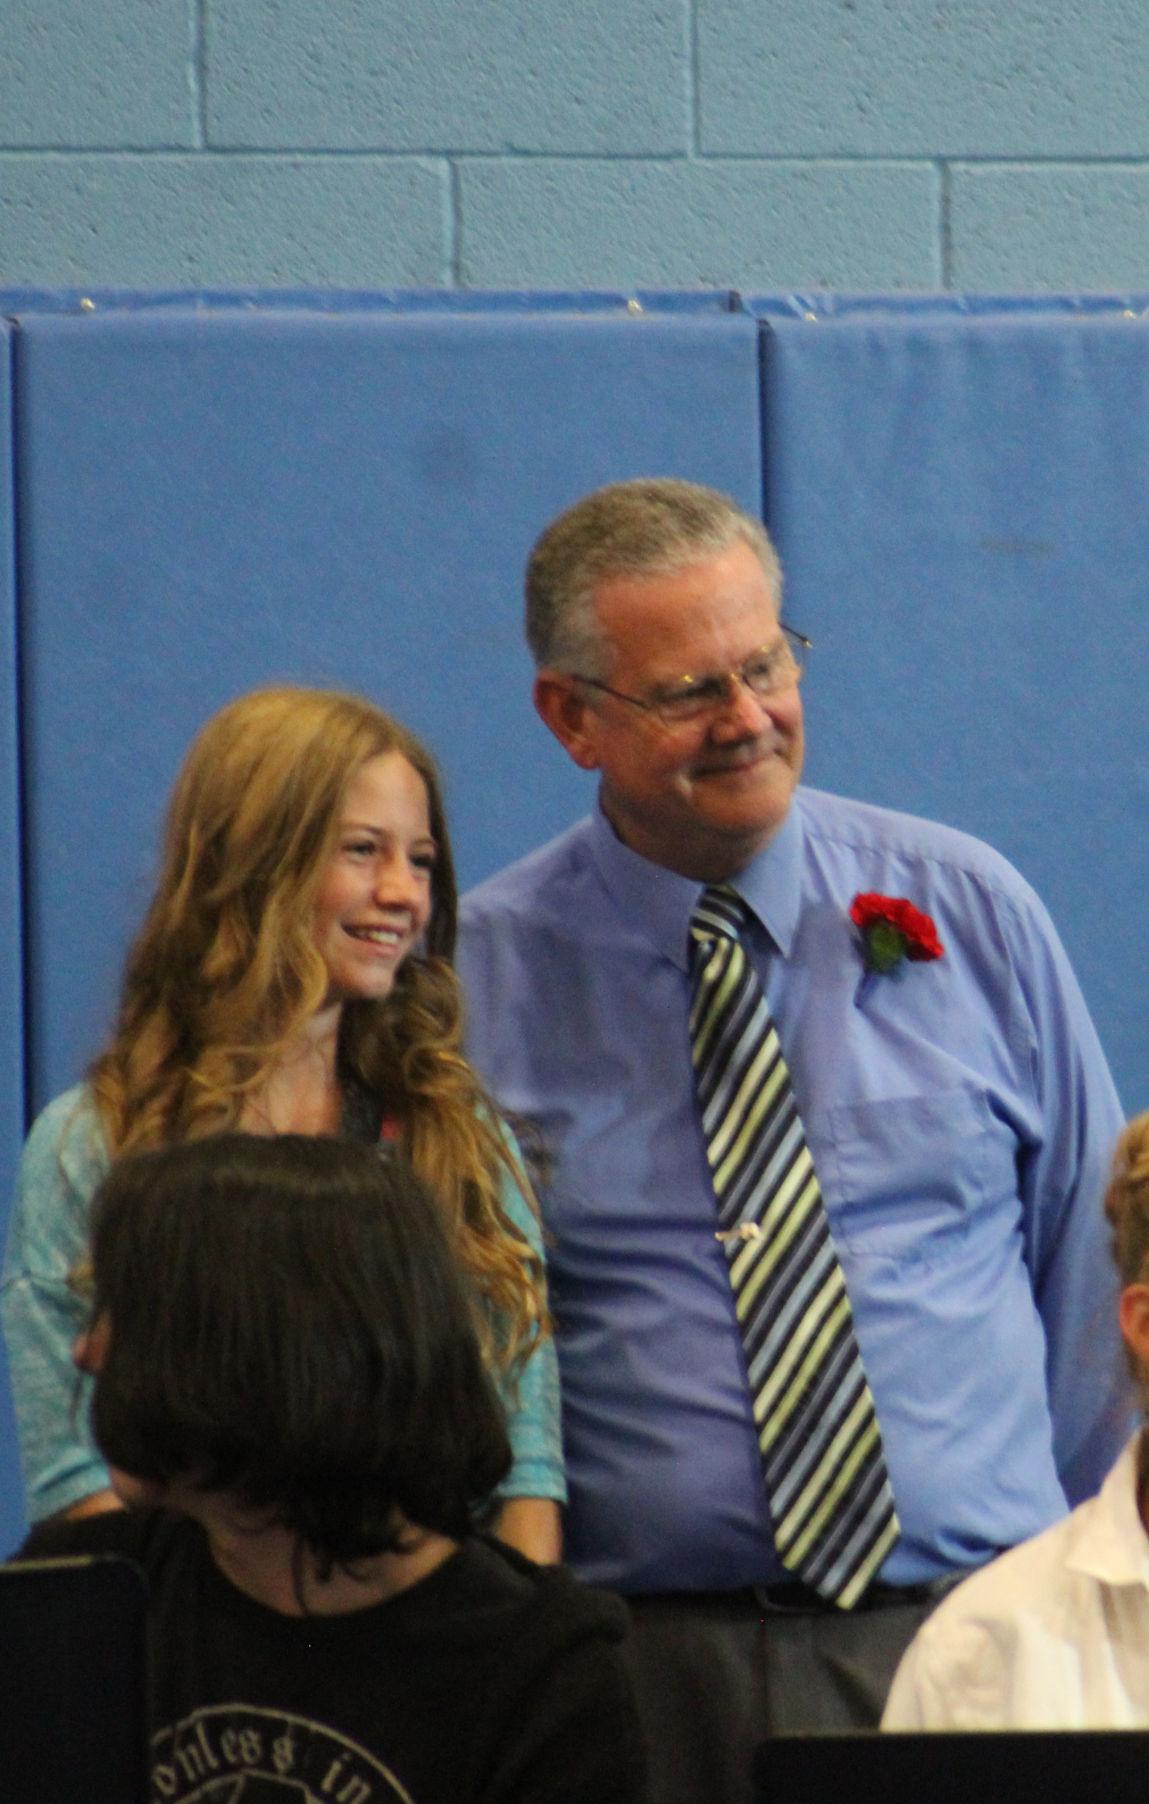 John Price with Student at 2018 Graduation